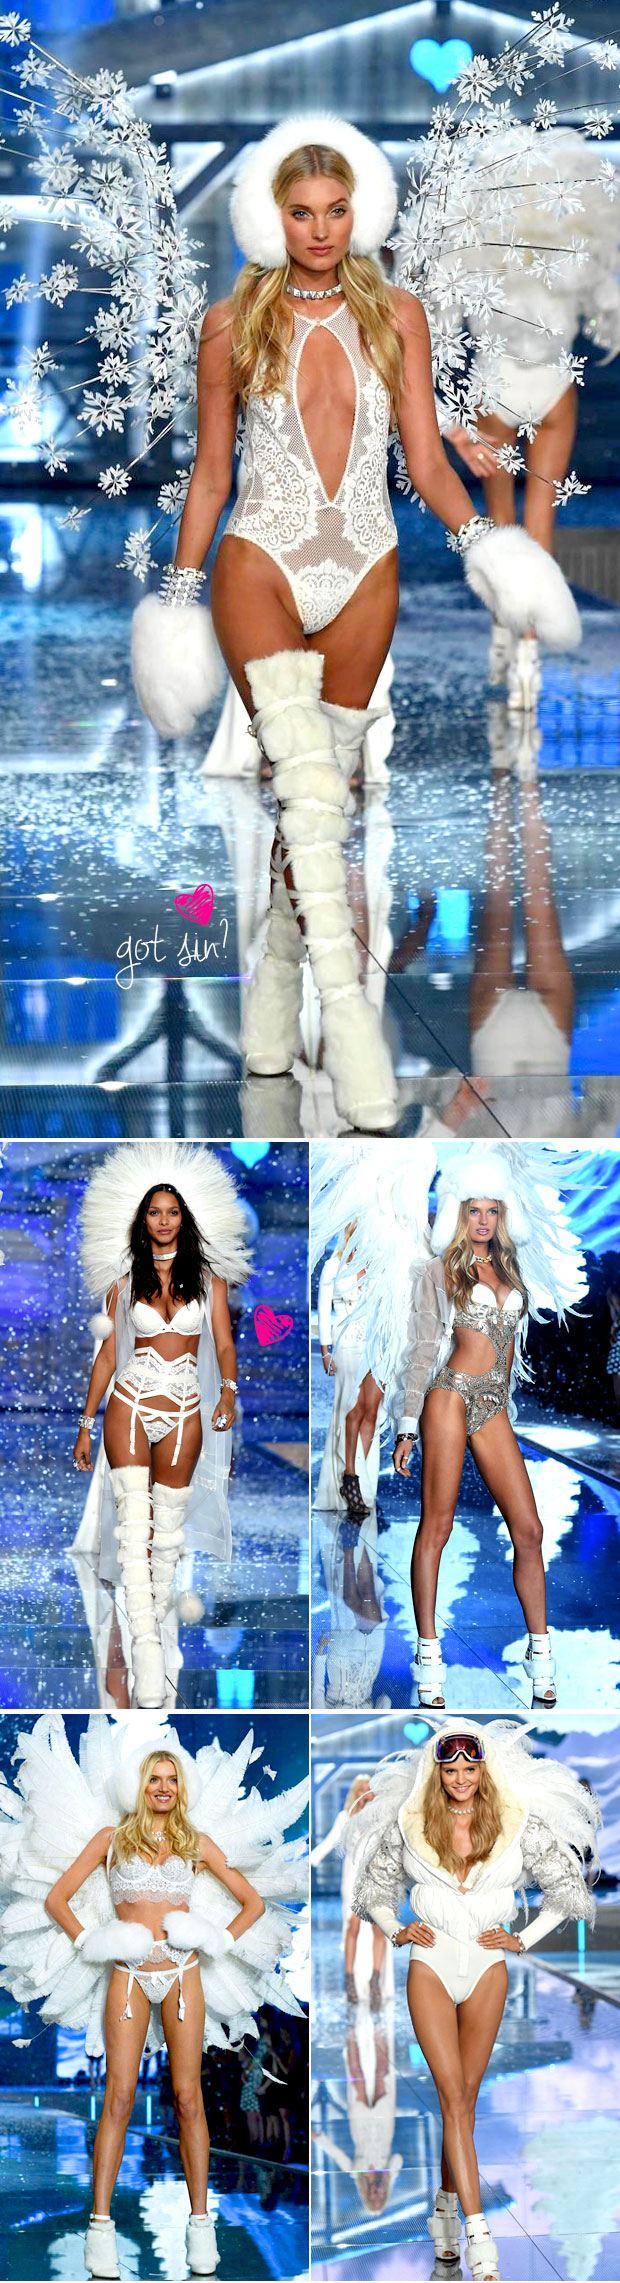 victorias-secret-fashion-show-snow-queens-todas-as-fotos-blog-got-sin-elsa-frozen-